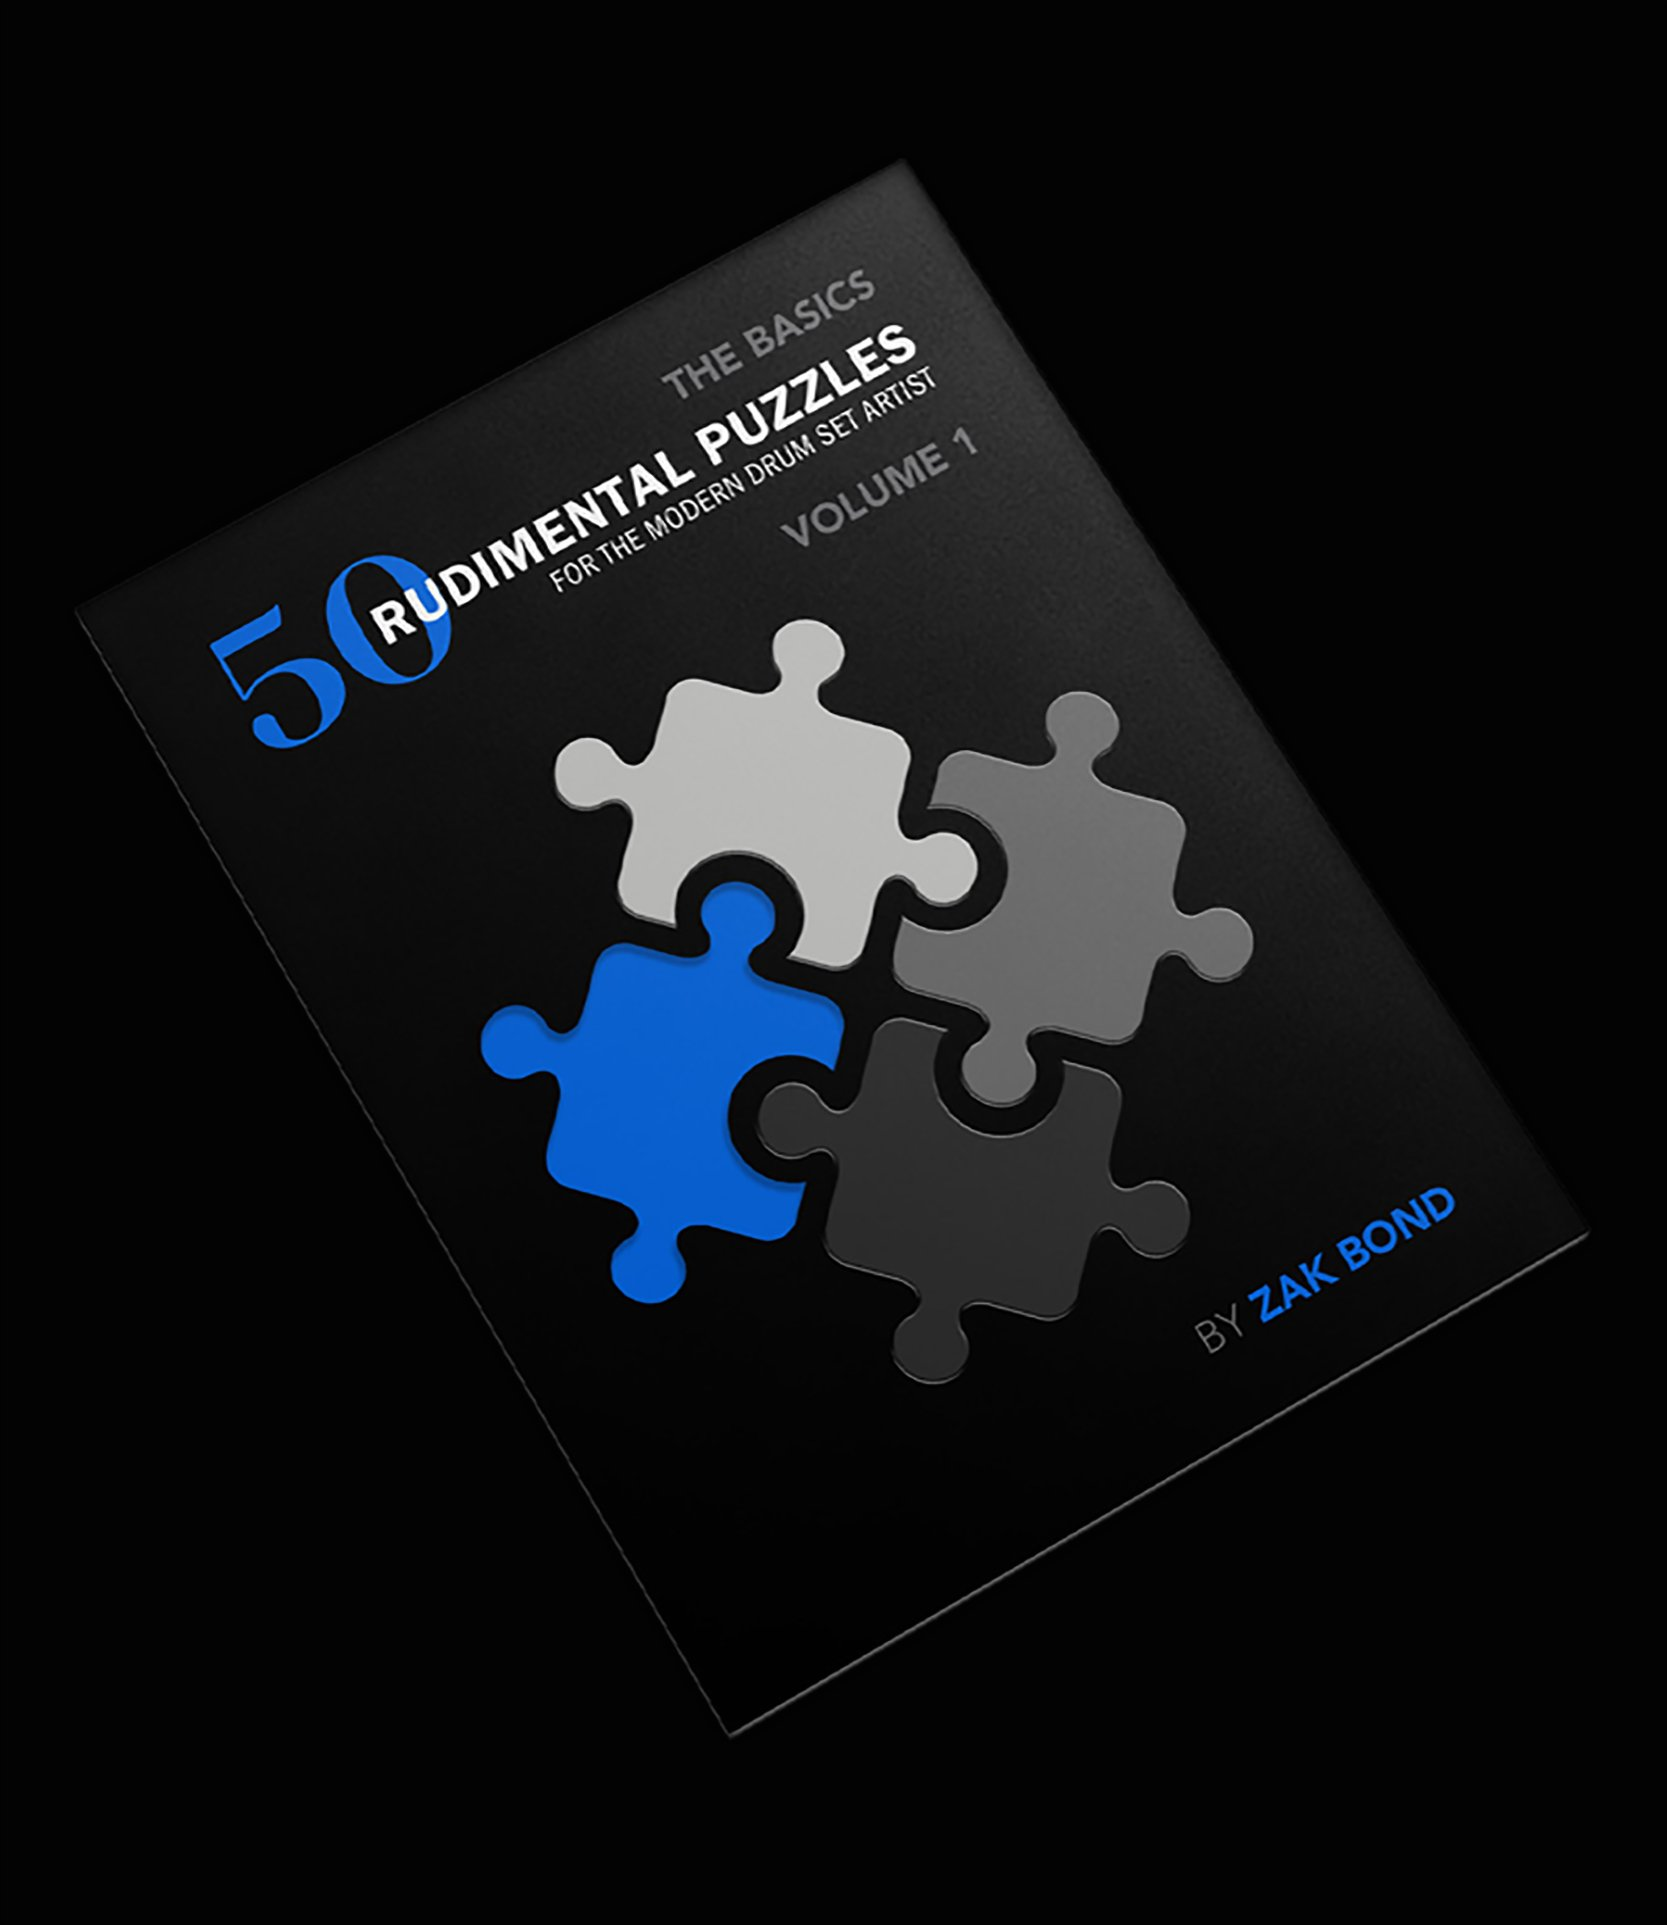 Zak Bond 50 Rudimental Puzzles for the Modern Drum Set Artist Volume 1 Cover